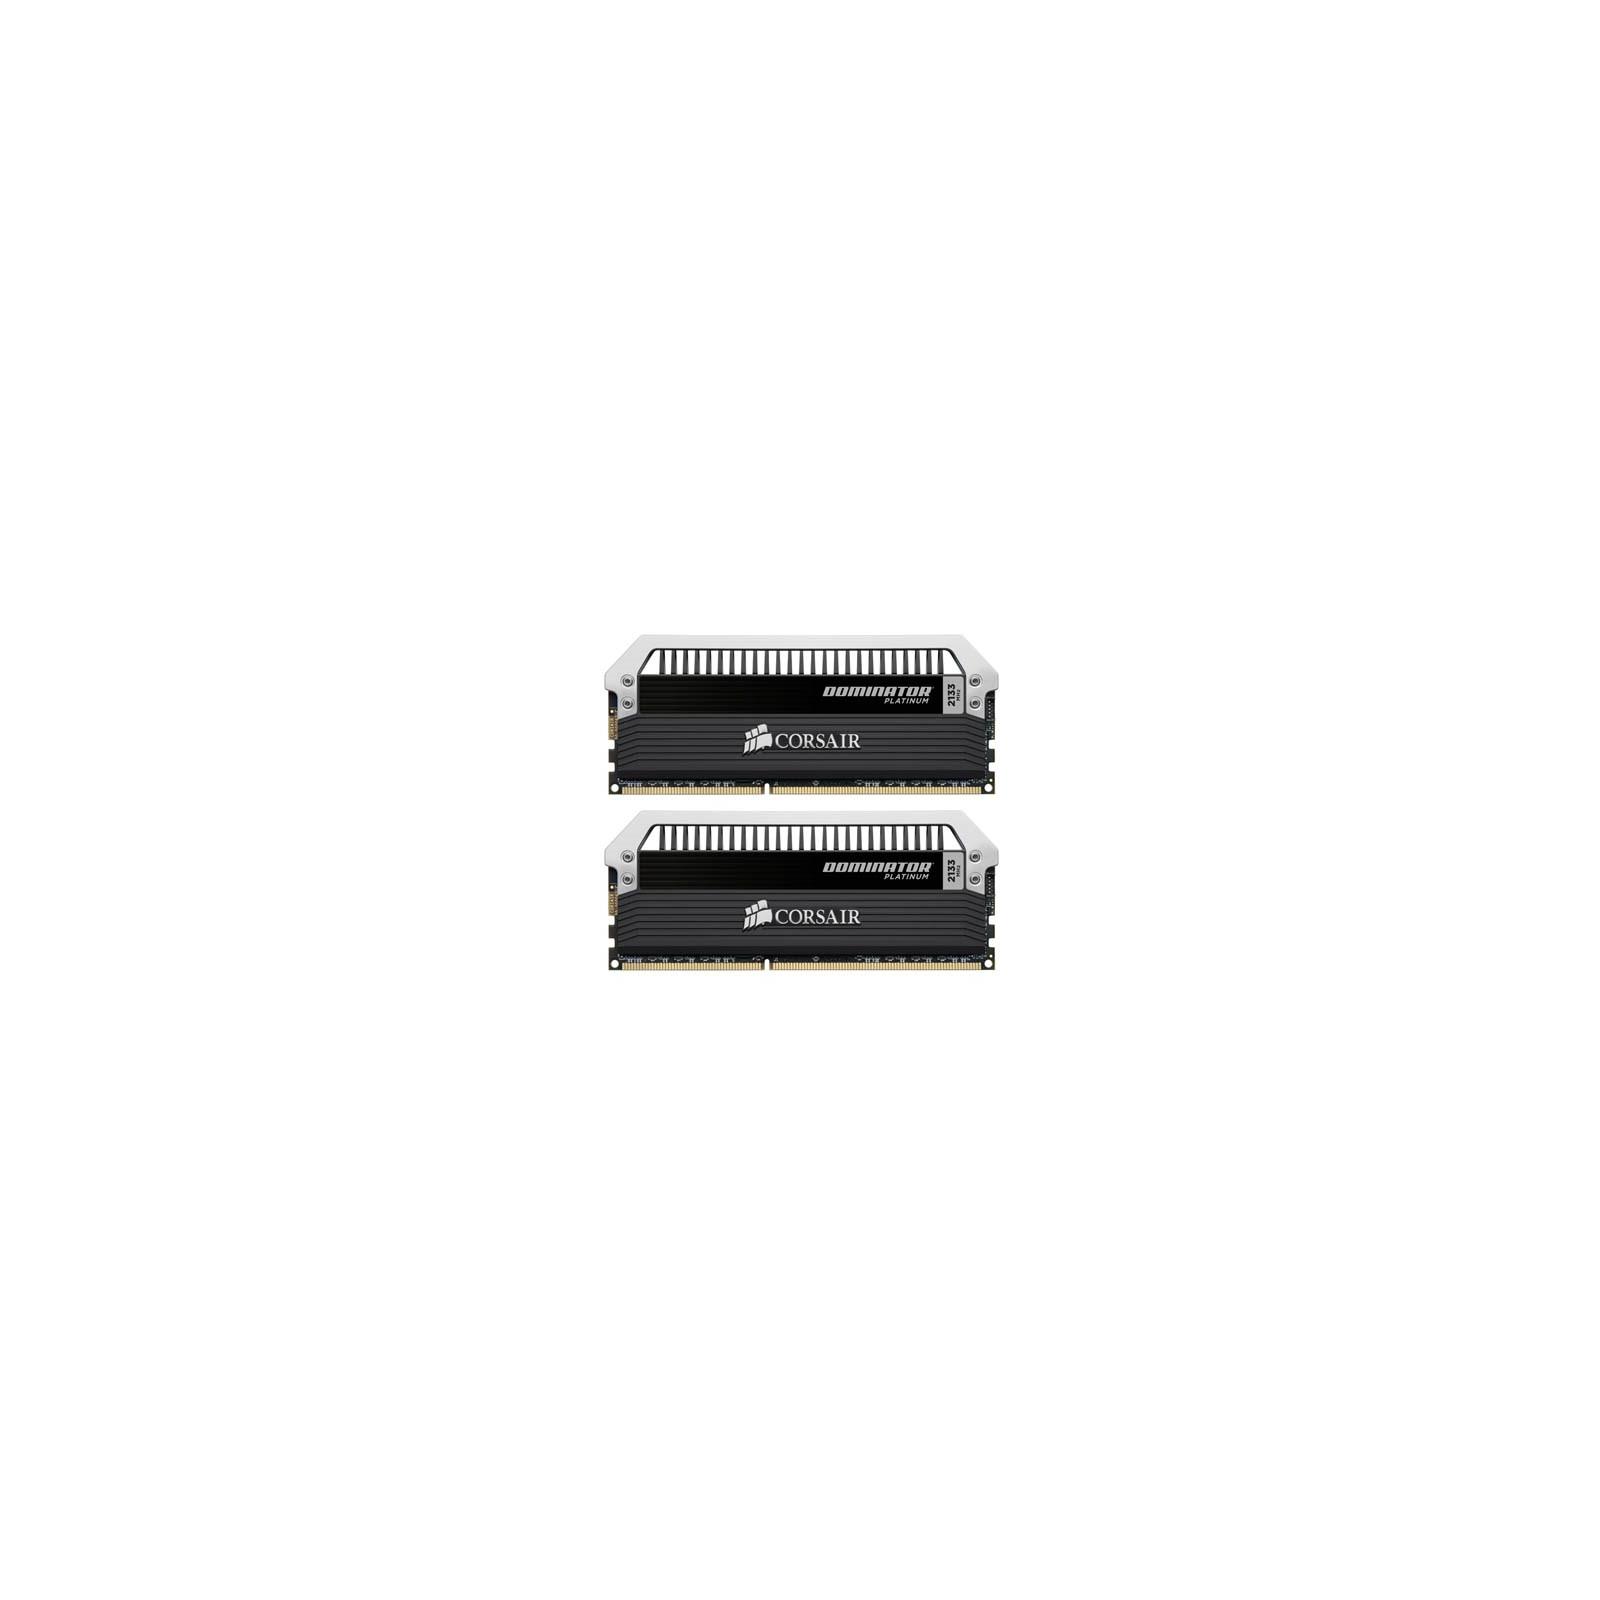 Модуль памяти для компьютера DDR3 8GB (2x4GB) 2133 MHz CORSAIR (CMD8GX3M2B2133C9)